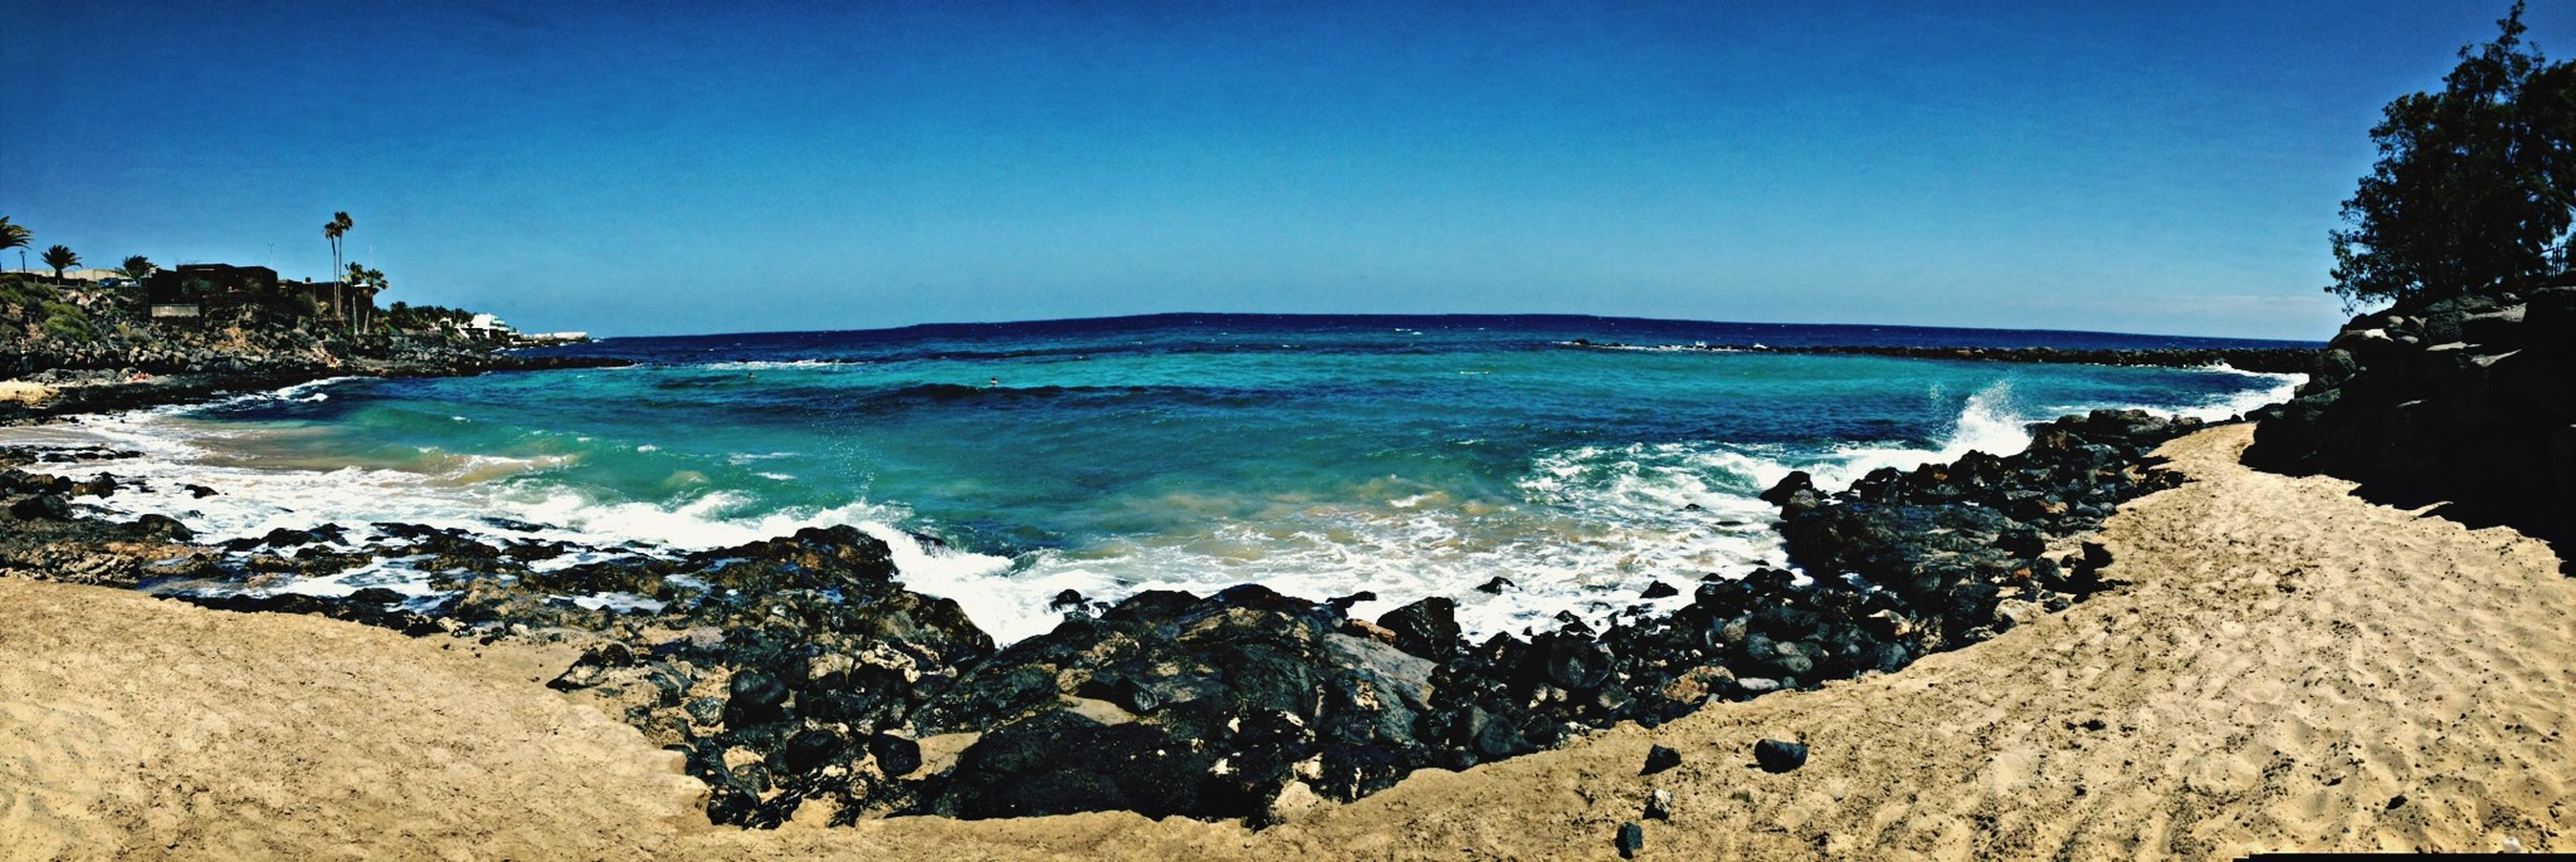 Île Canaries Beutiful  Paysage Paradise